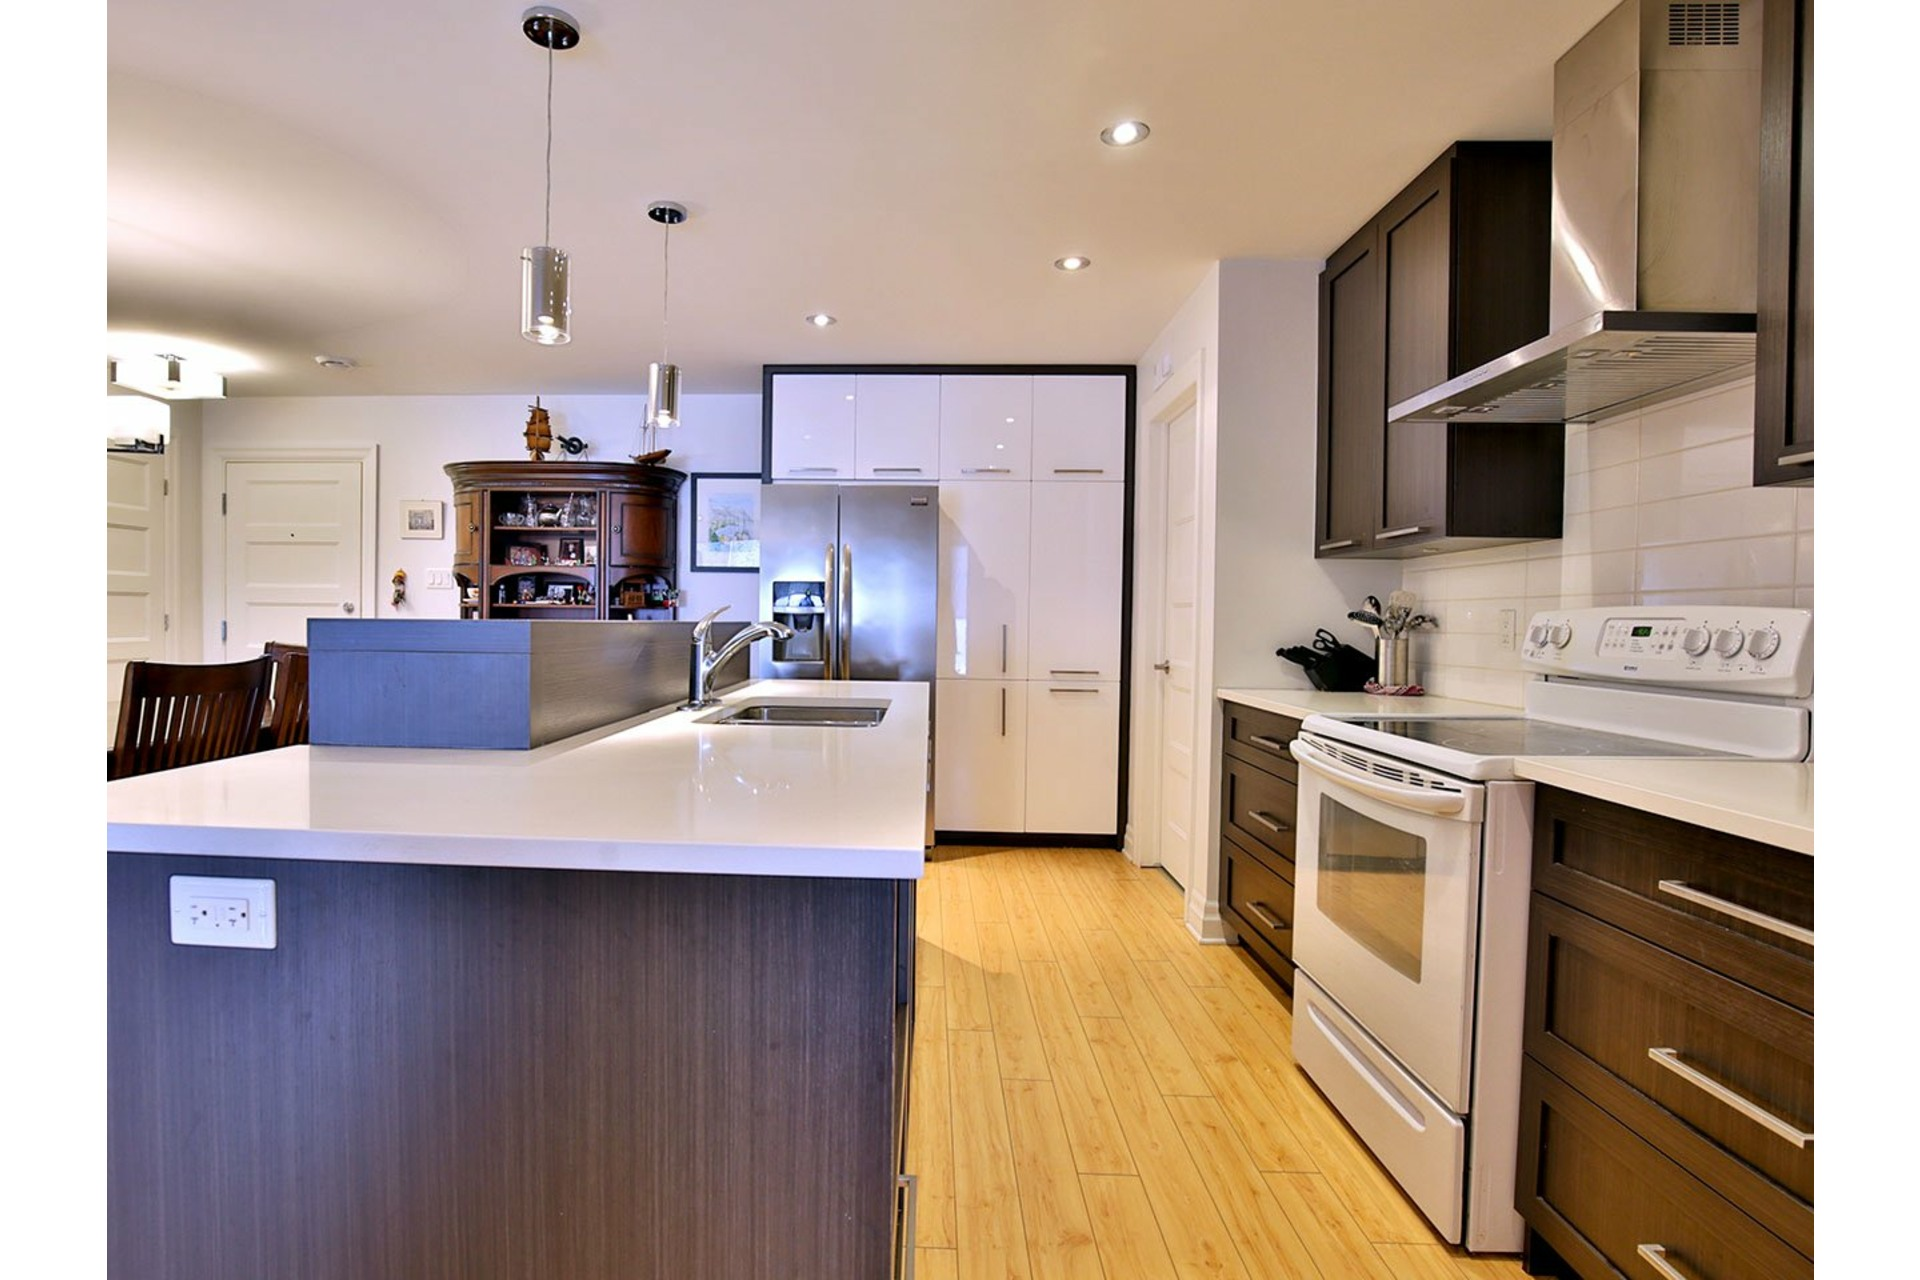 image 5 - Apartment For sale Varennes - 5 rooms